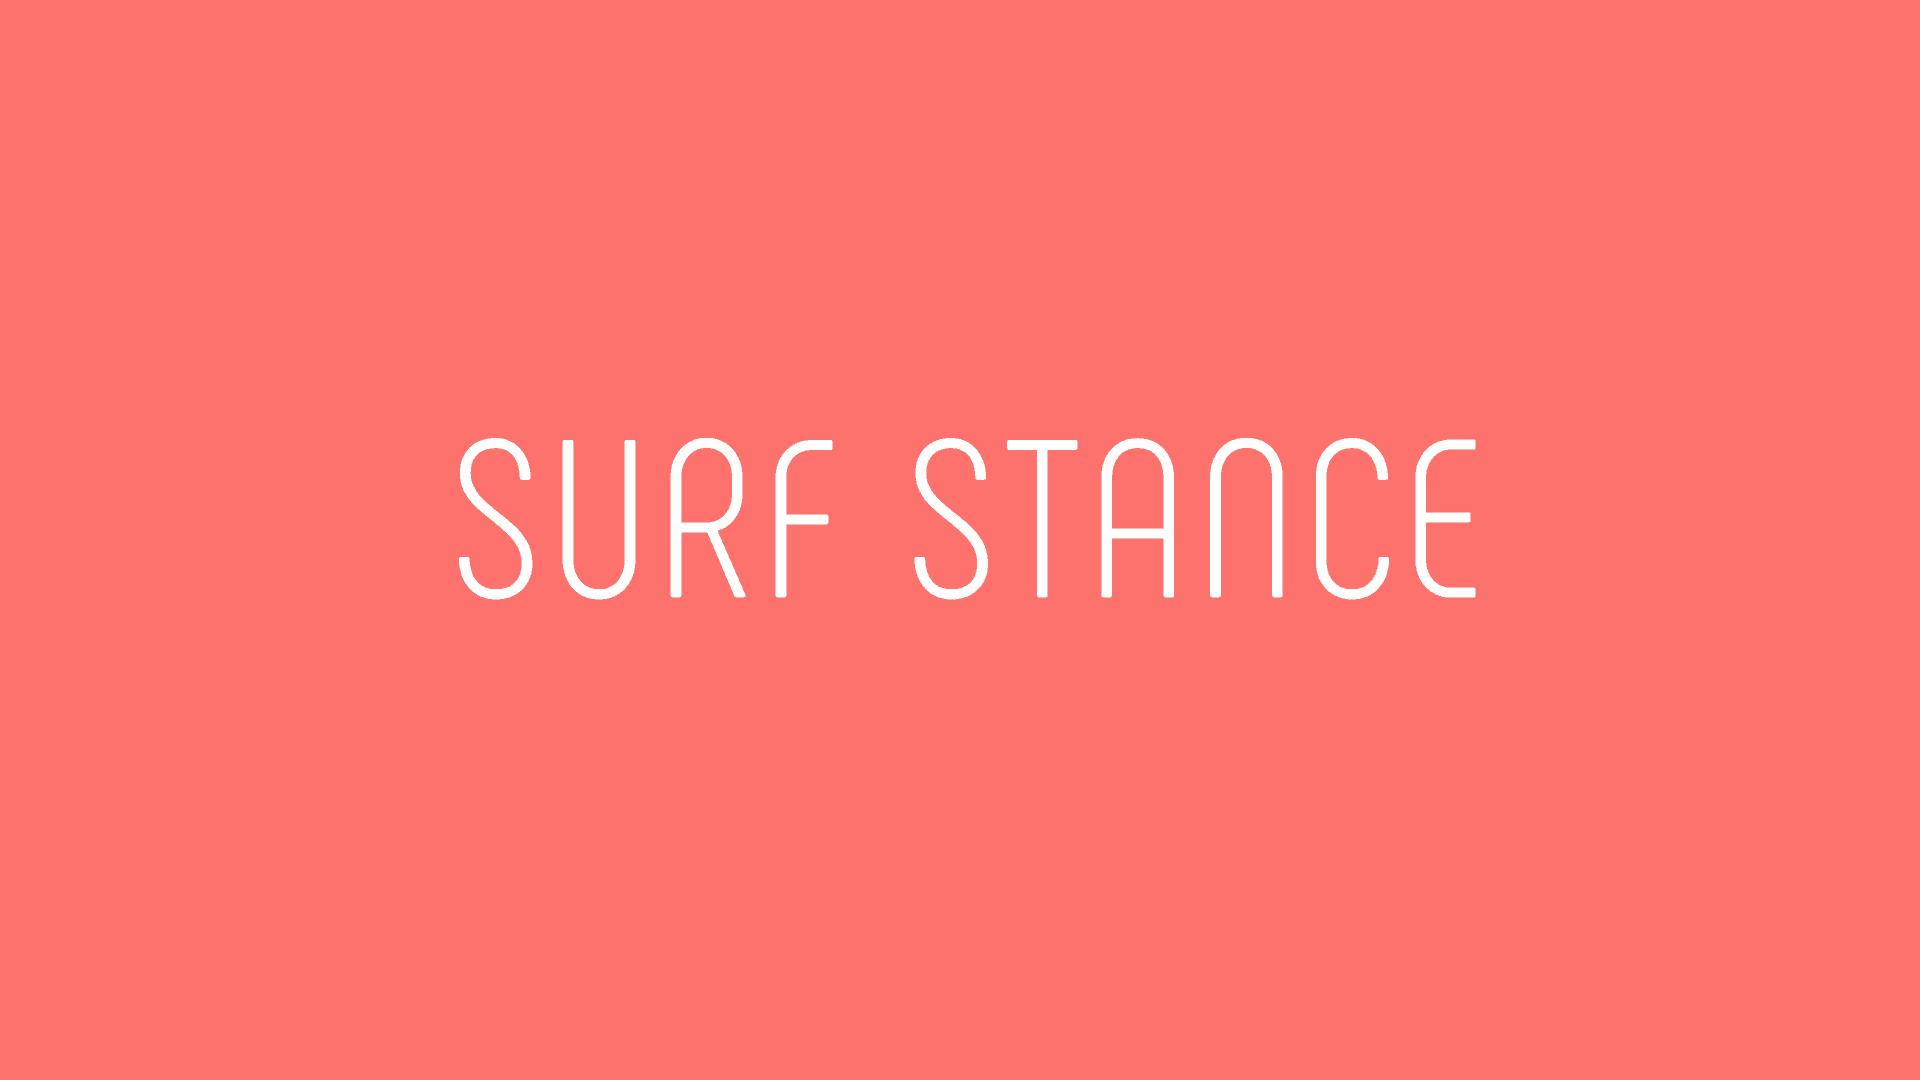 SURF STANCE